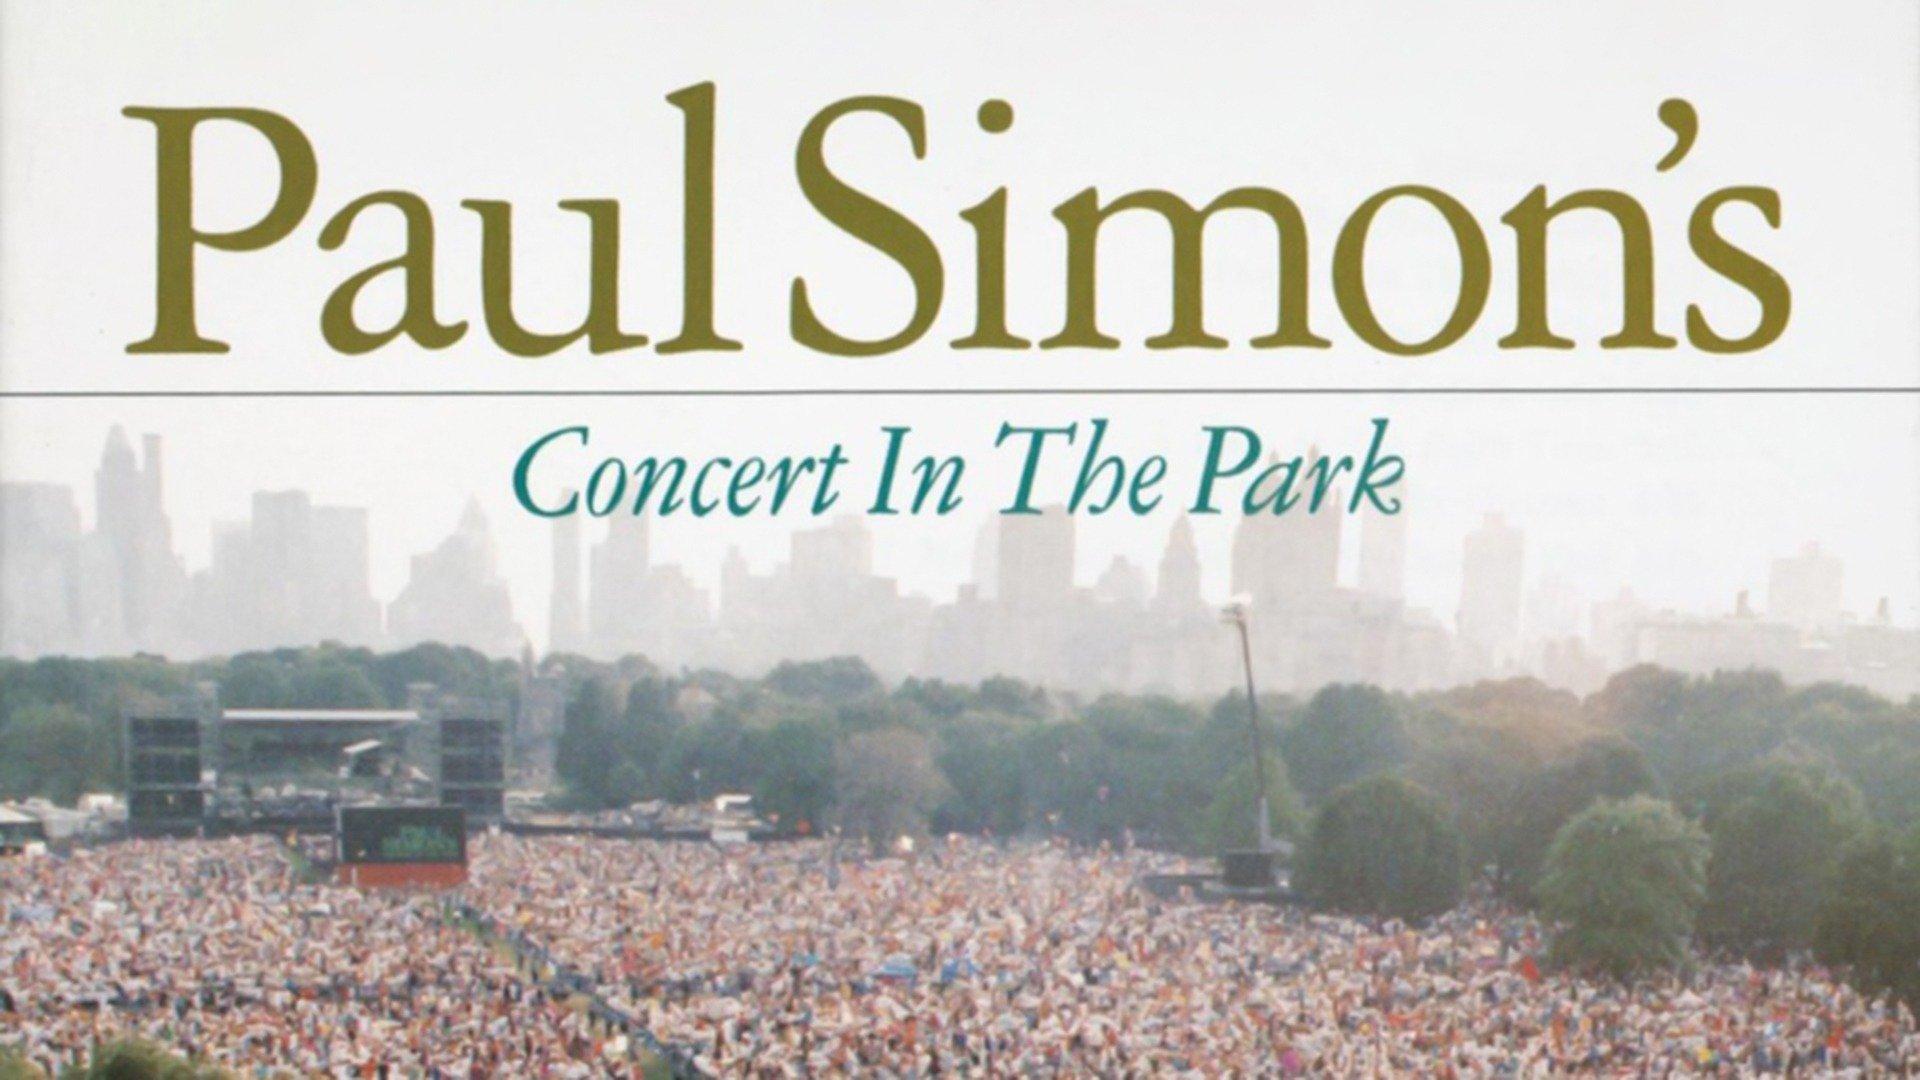 Paul Simon: Concert In The Park